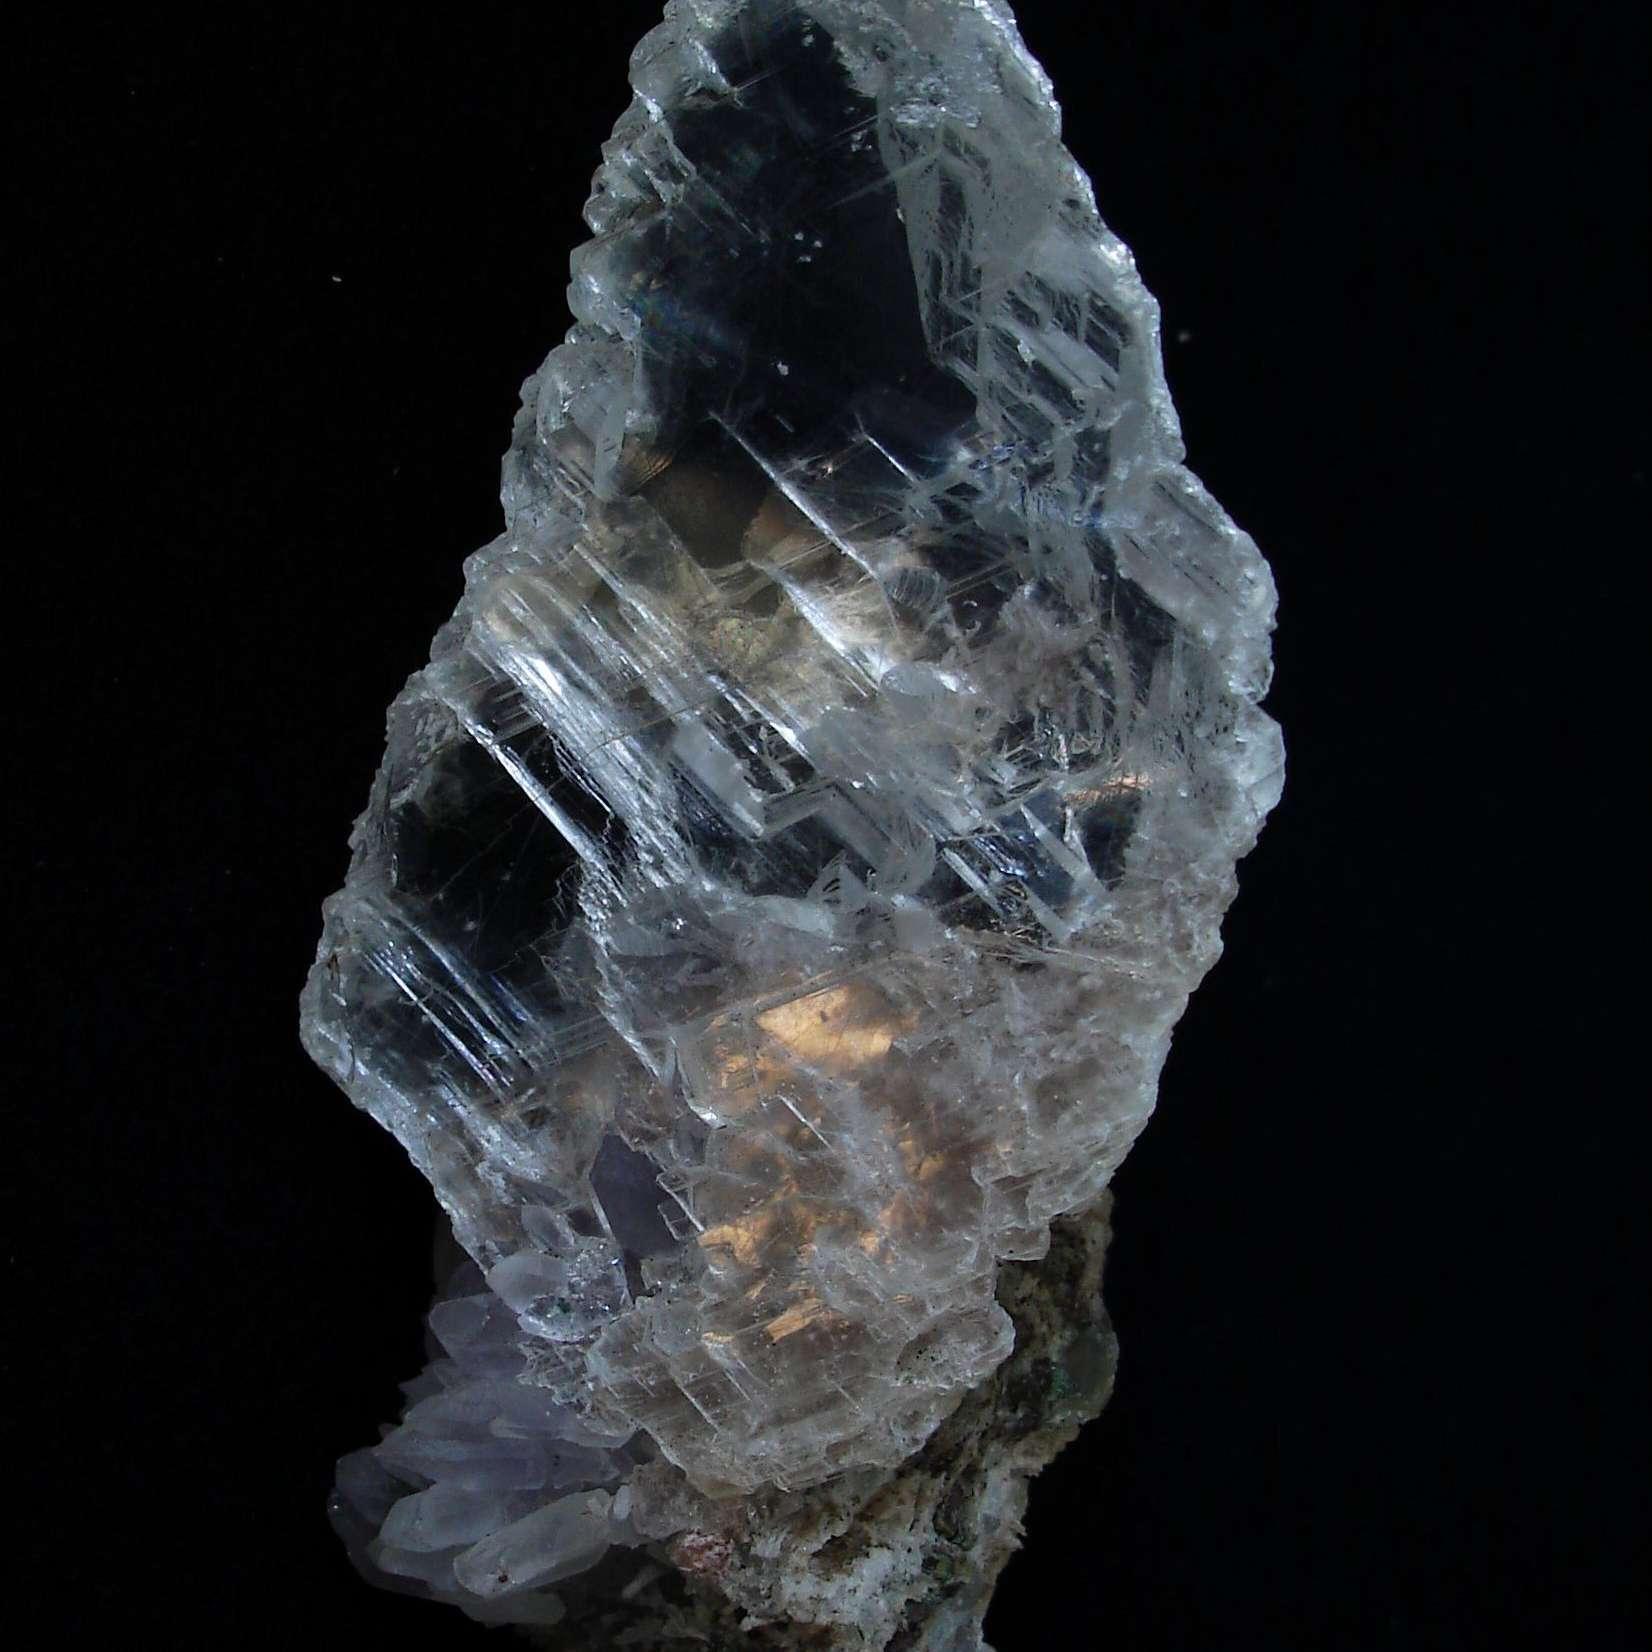 Clear selenite gypsum on a black background.